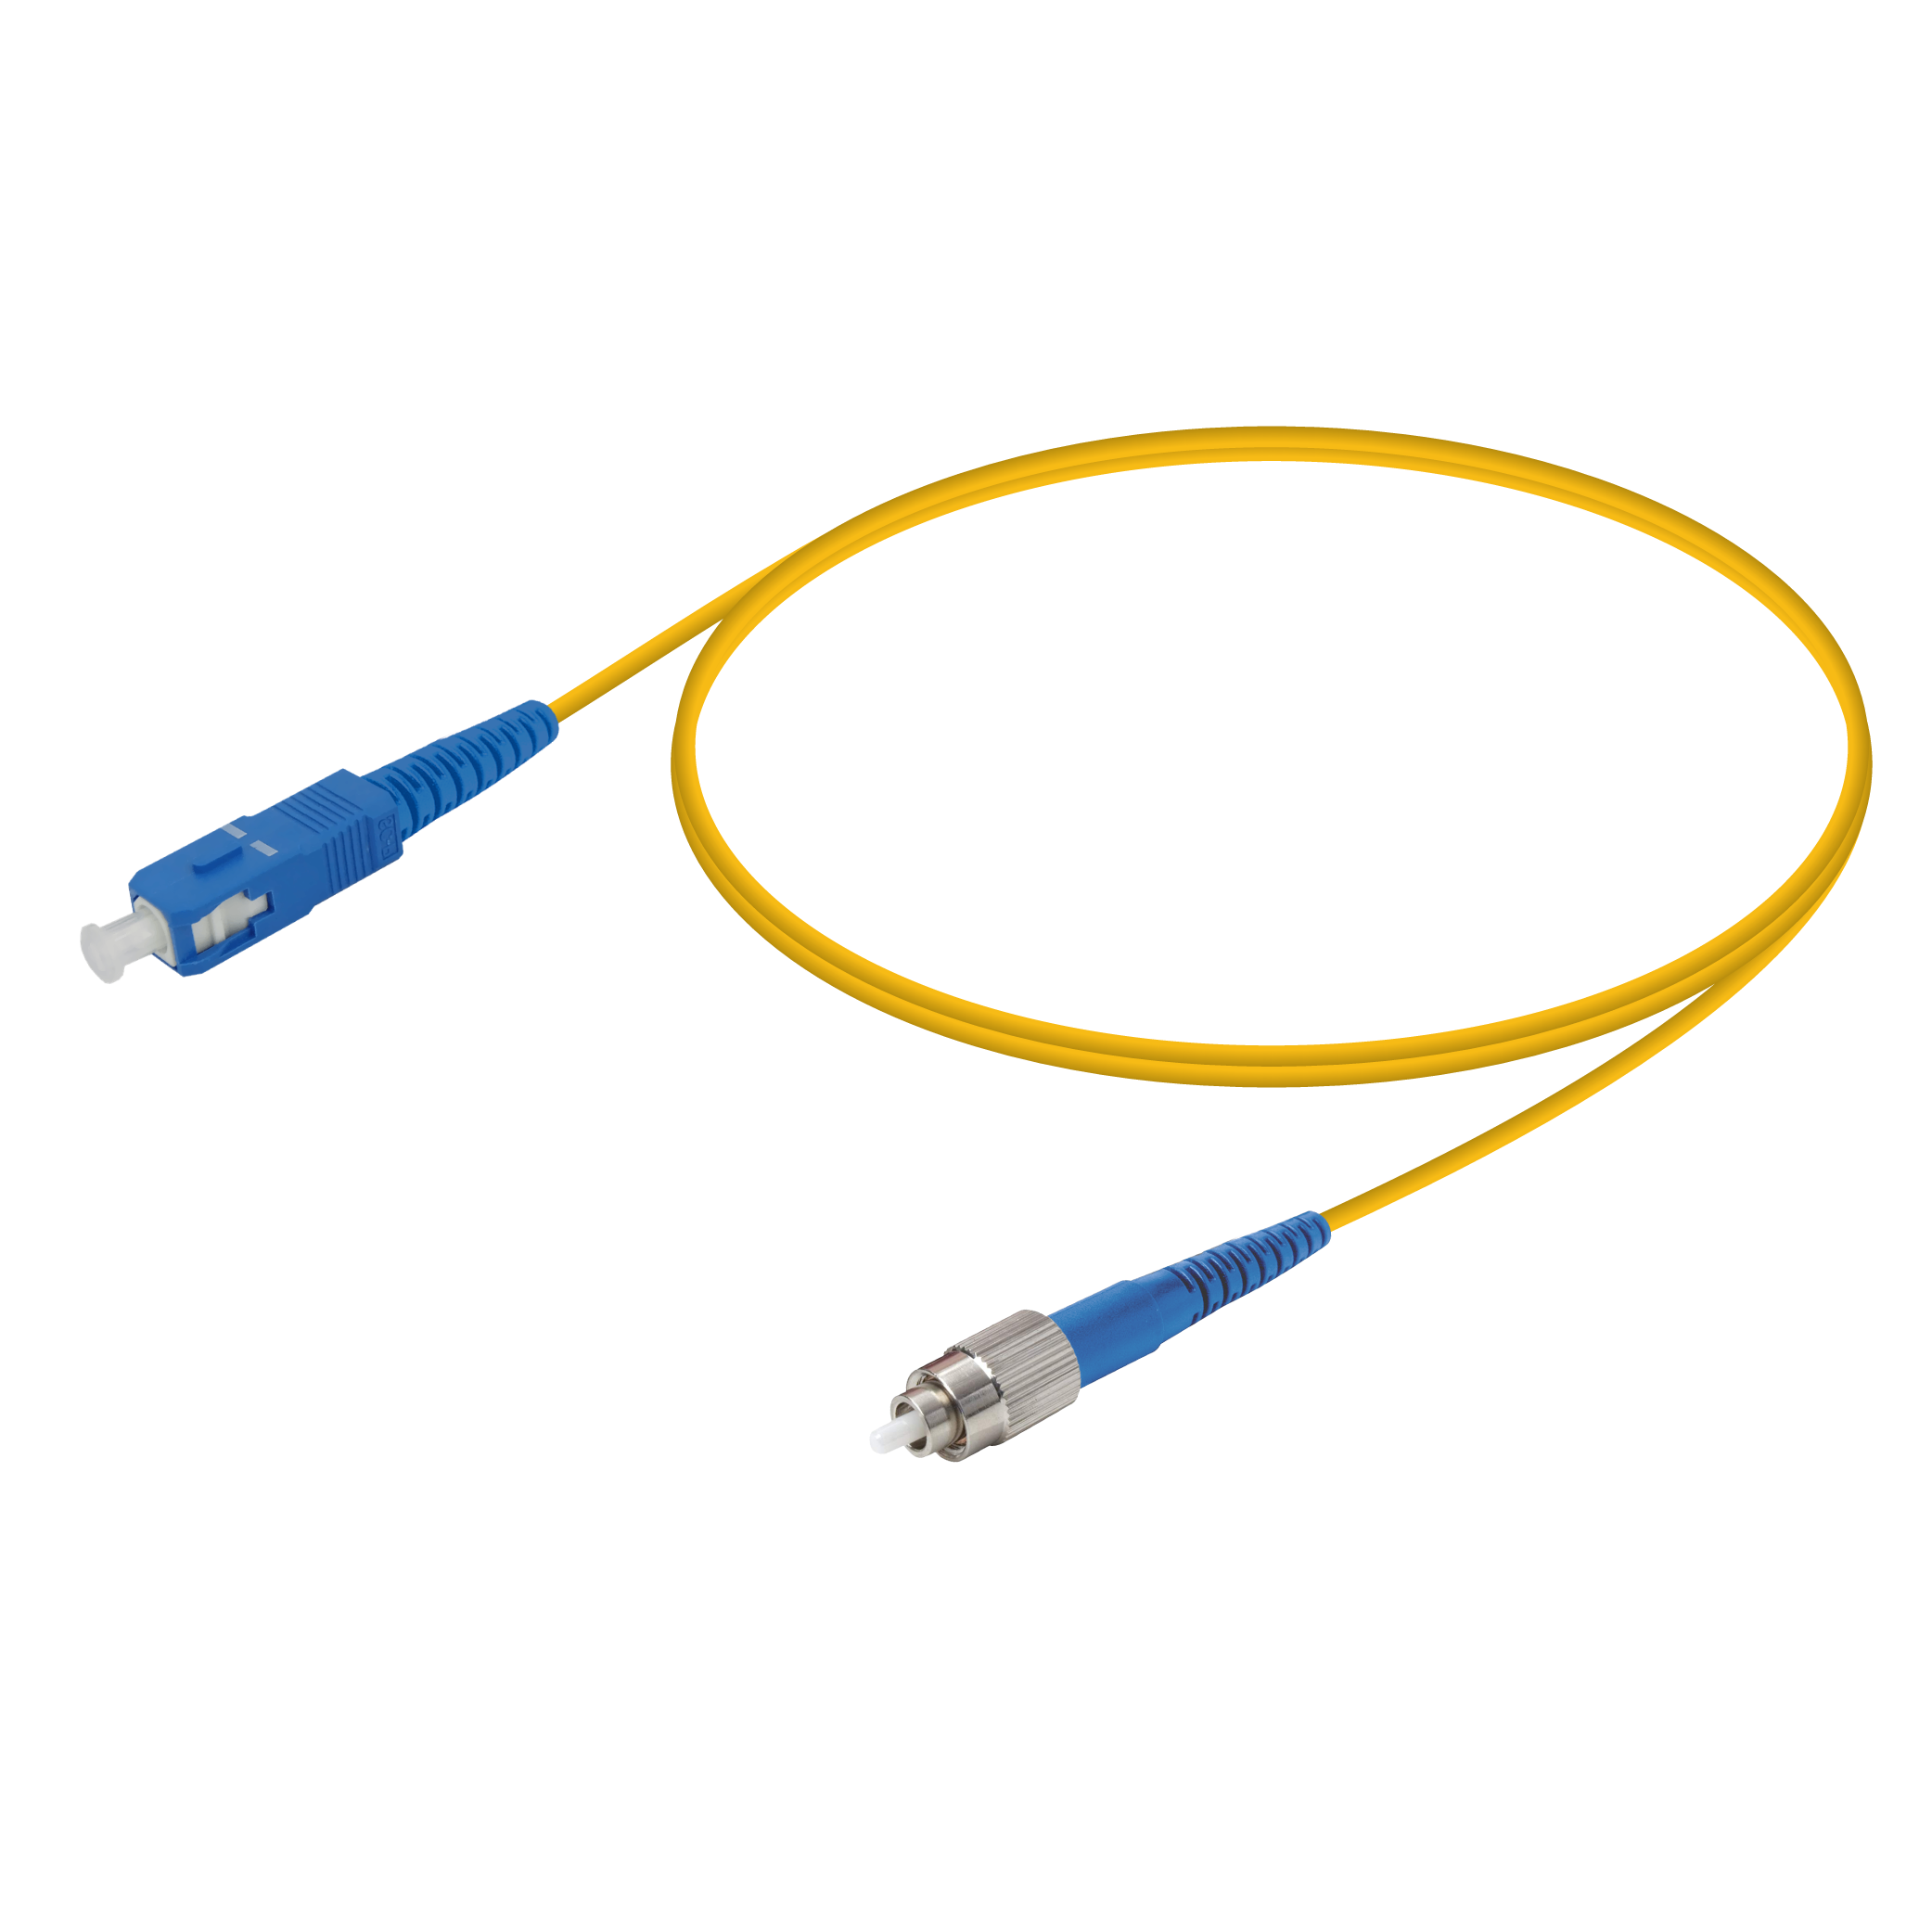 SC/UPC-FC/UPC | Single Mode G657.A2 Simplex Patch Cord | 2.0mm